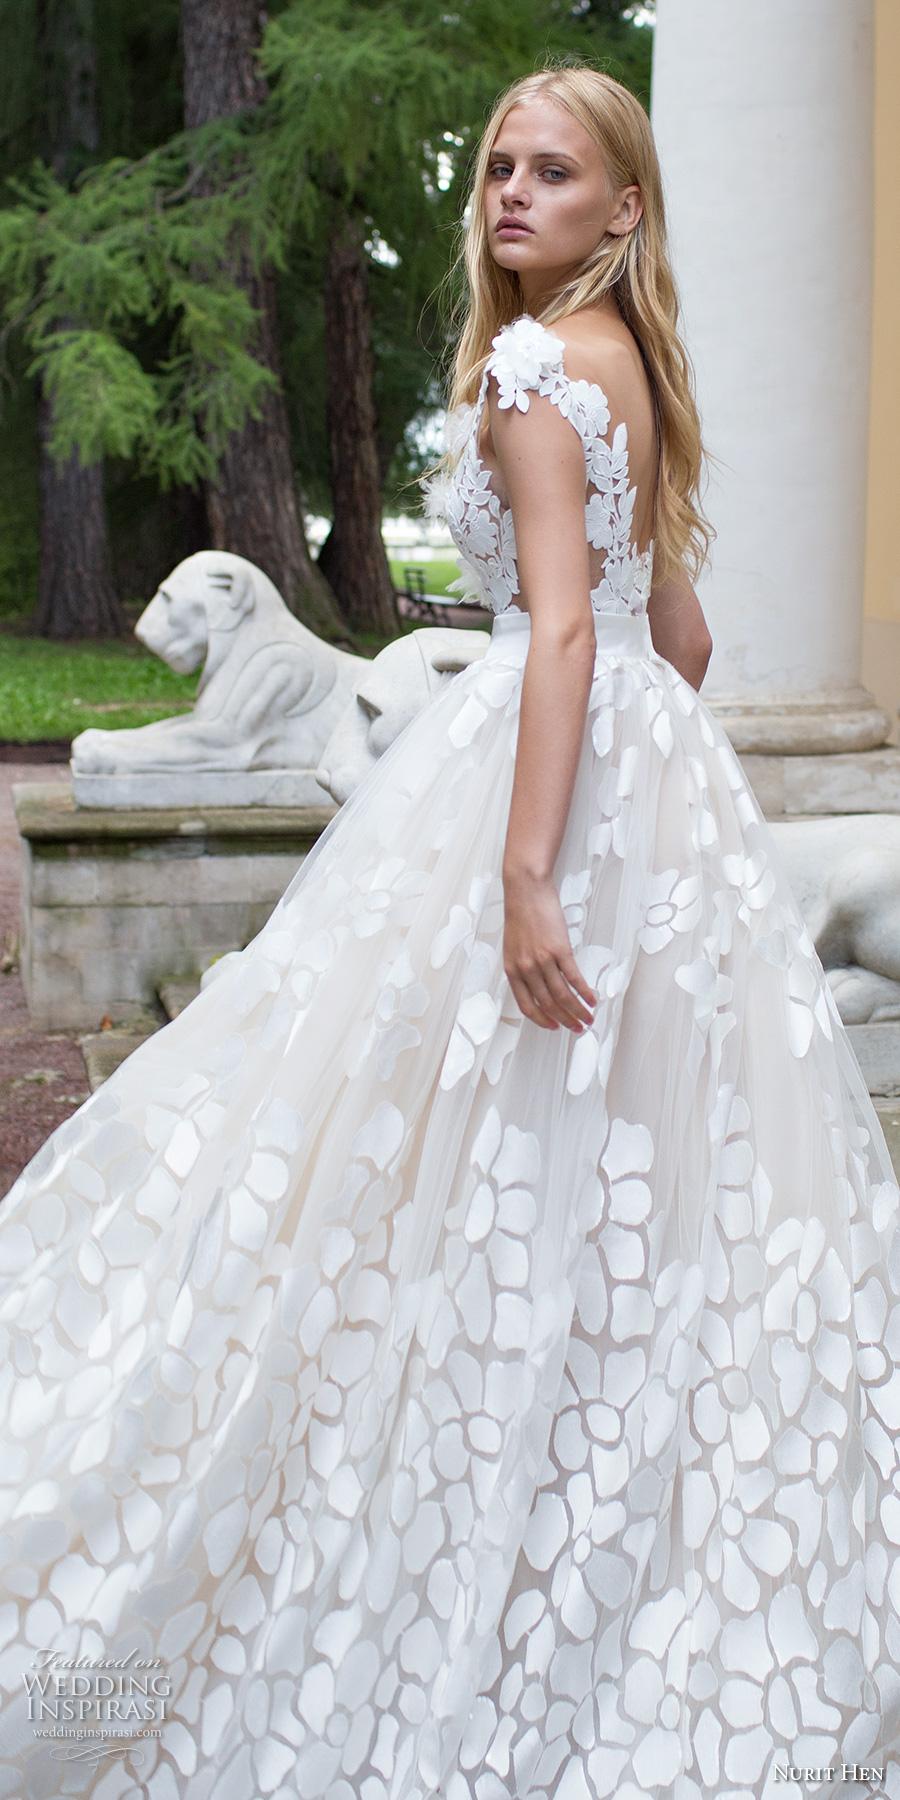 nurit hen 2017 bridal cap sleeves deep v neck full embellishment romantic a line ball gown wedding dress open v back sweep train (1) zbv